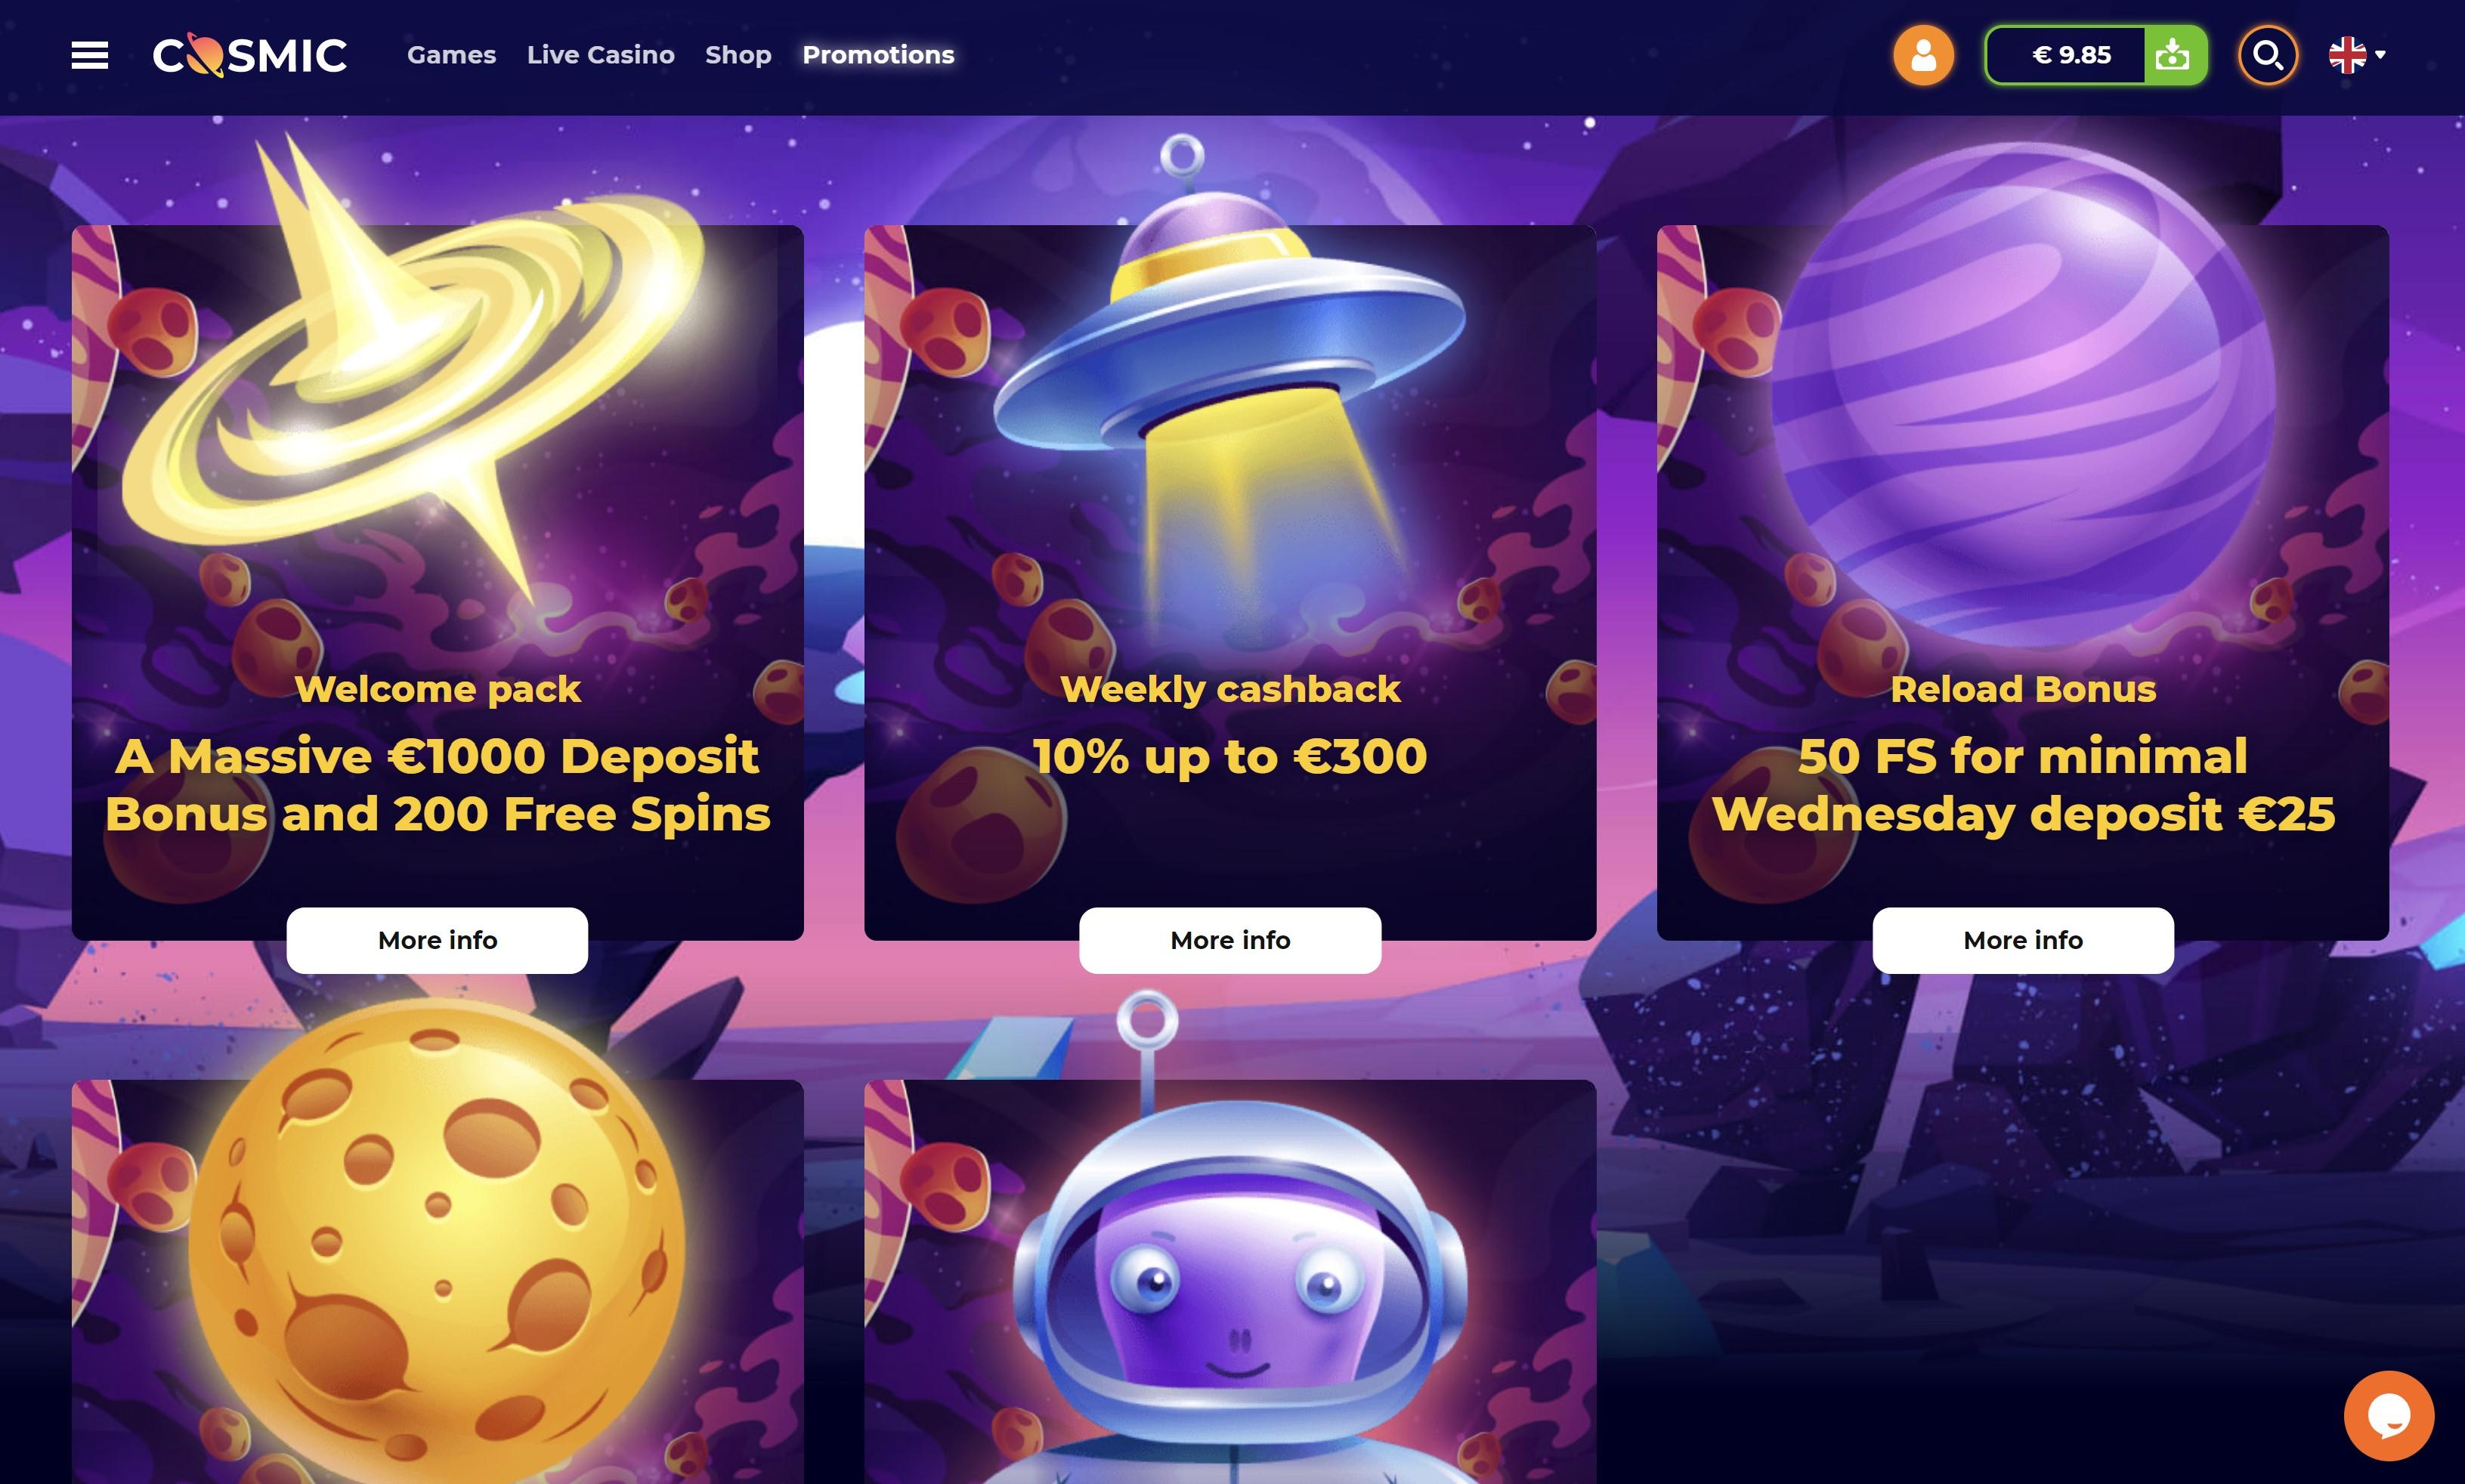 cosmicslot bonus kazino premija - cosmic slot no deposit bonus code